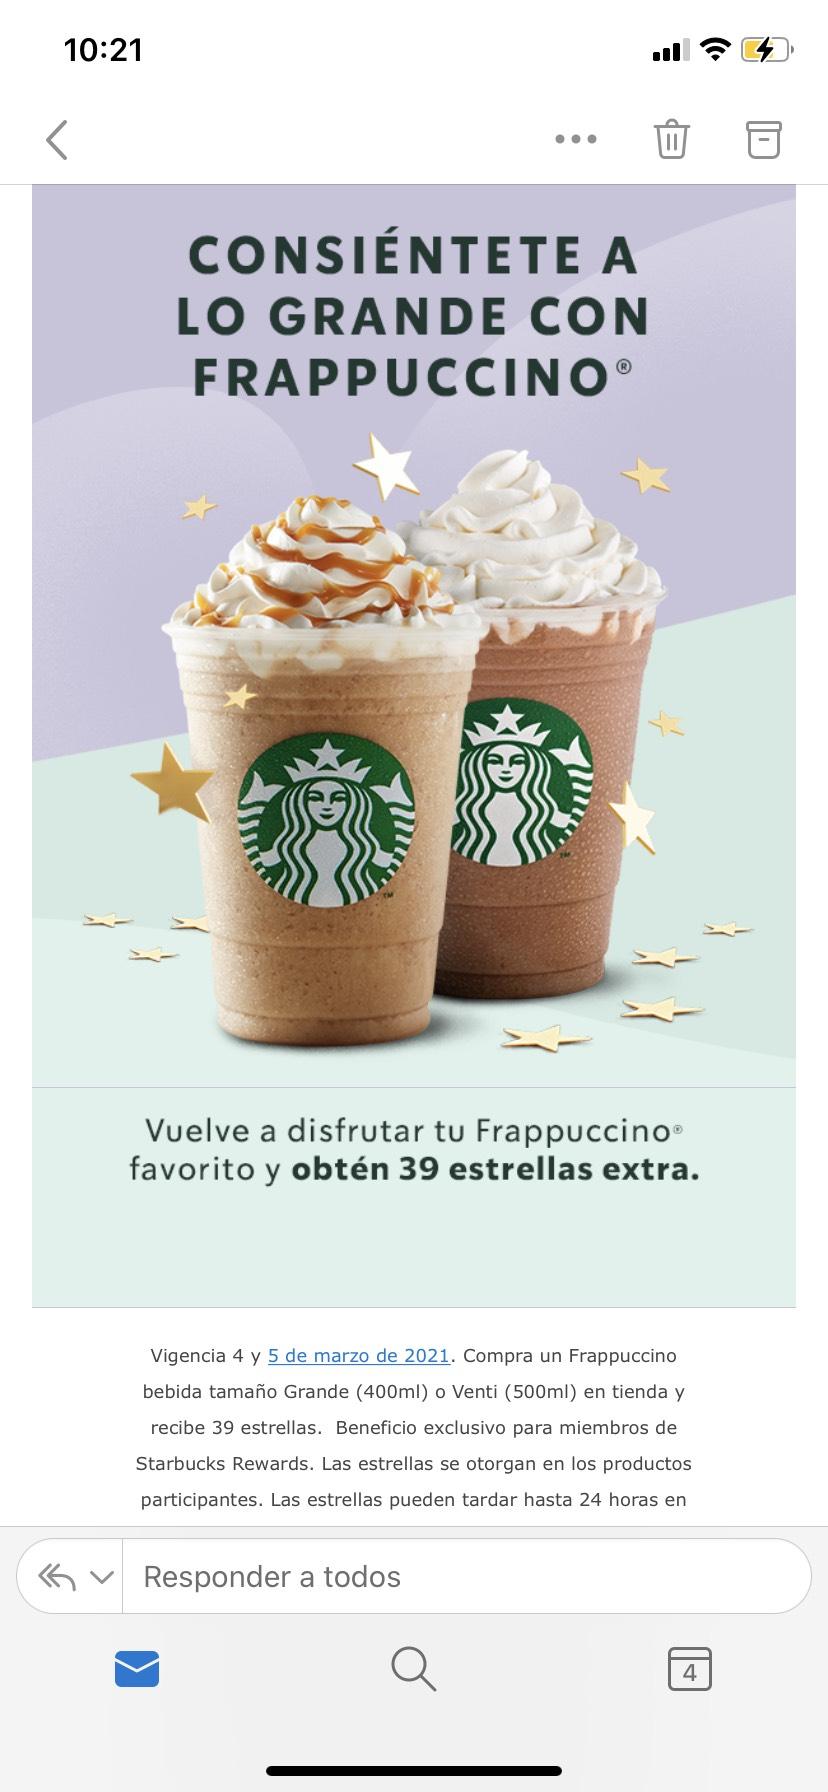 Starbucks: 39 estrellas extra al comprar un frappuccino grande o venti